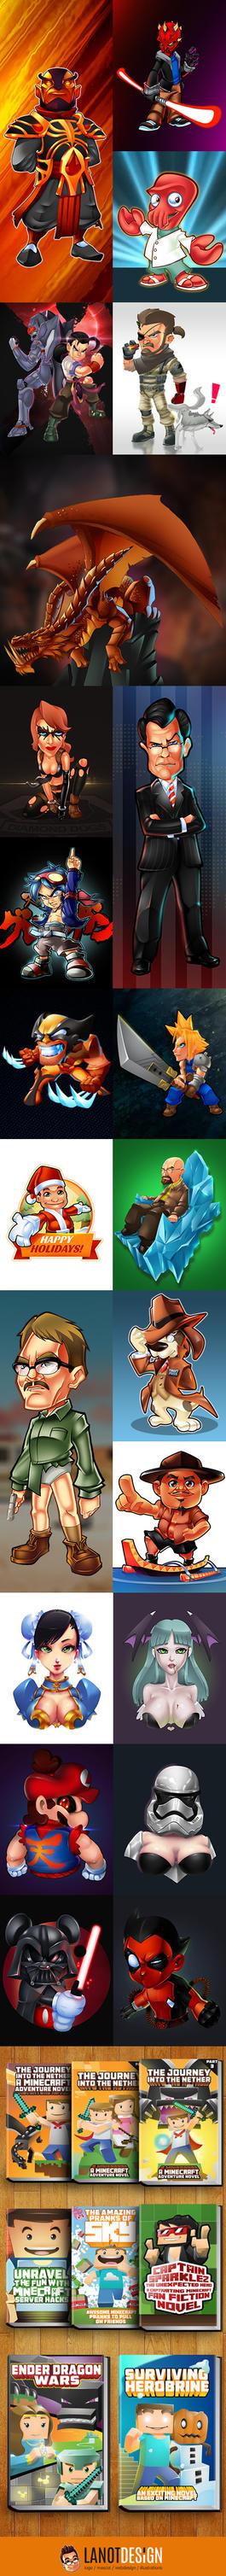 Illustration Compilations by LanotDesign